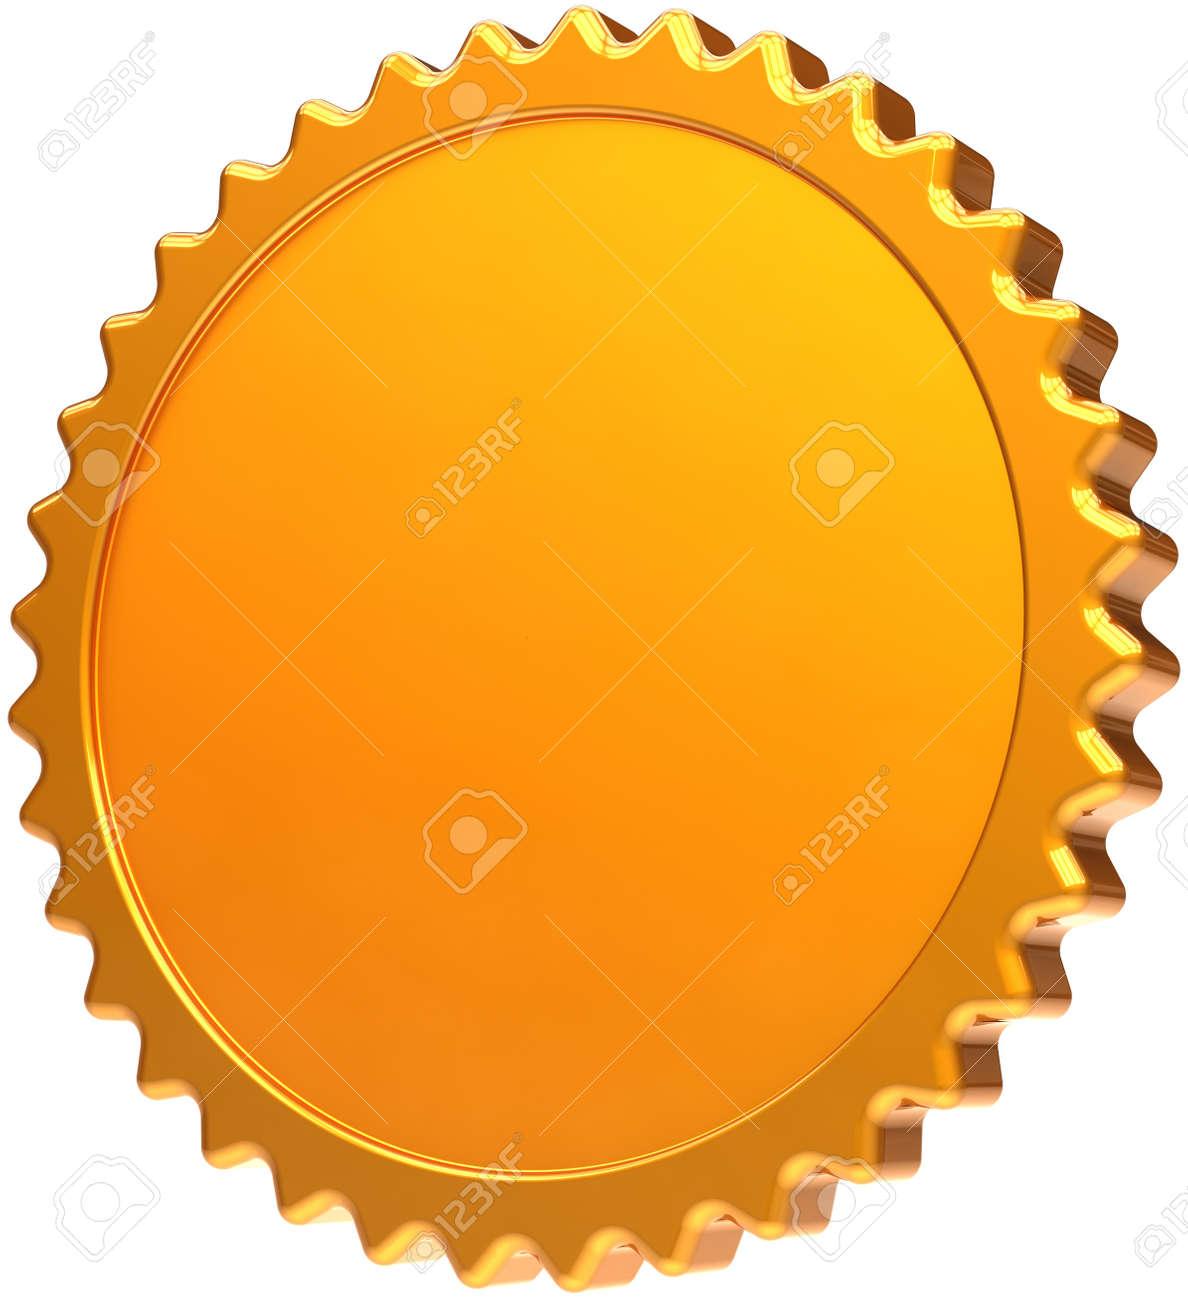 blank golden medal award design element luxury champion badge